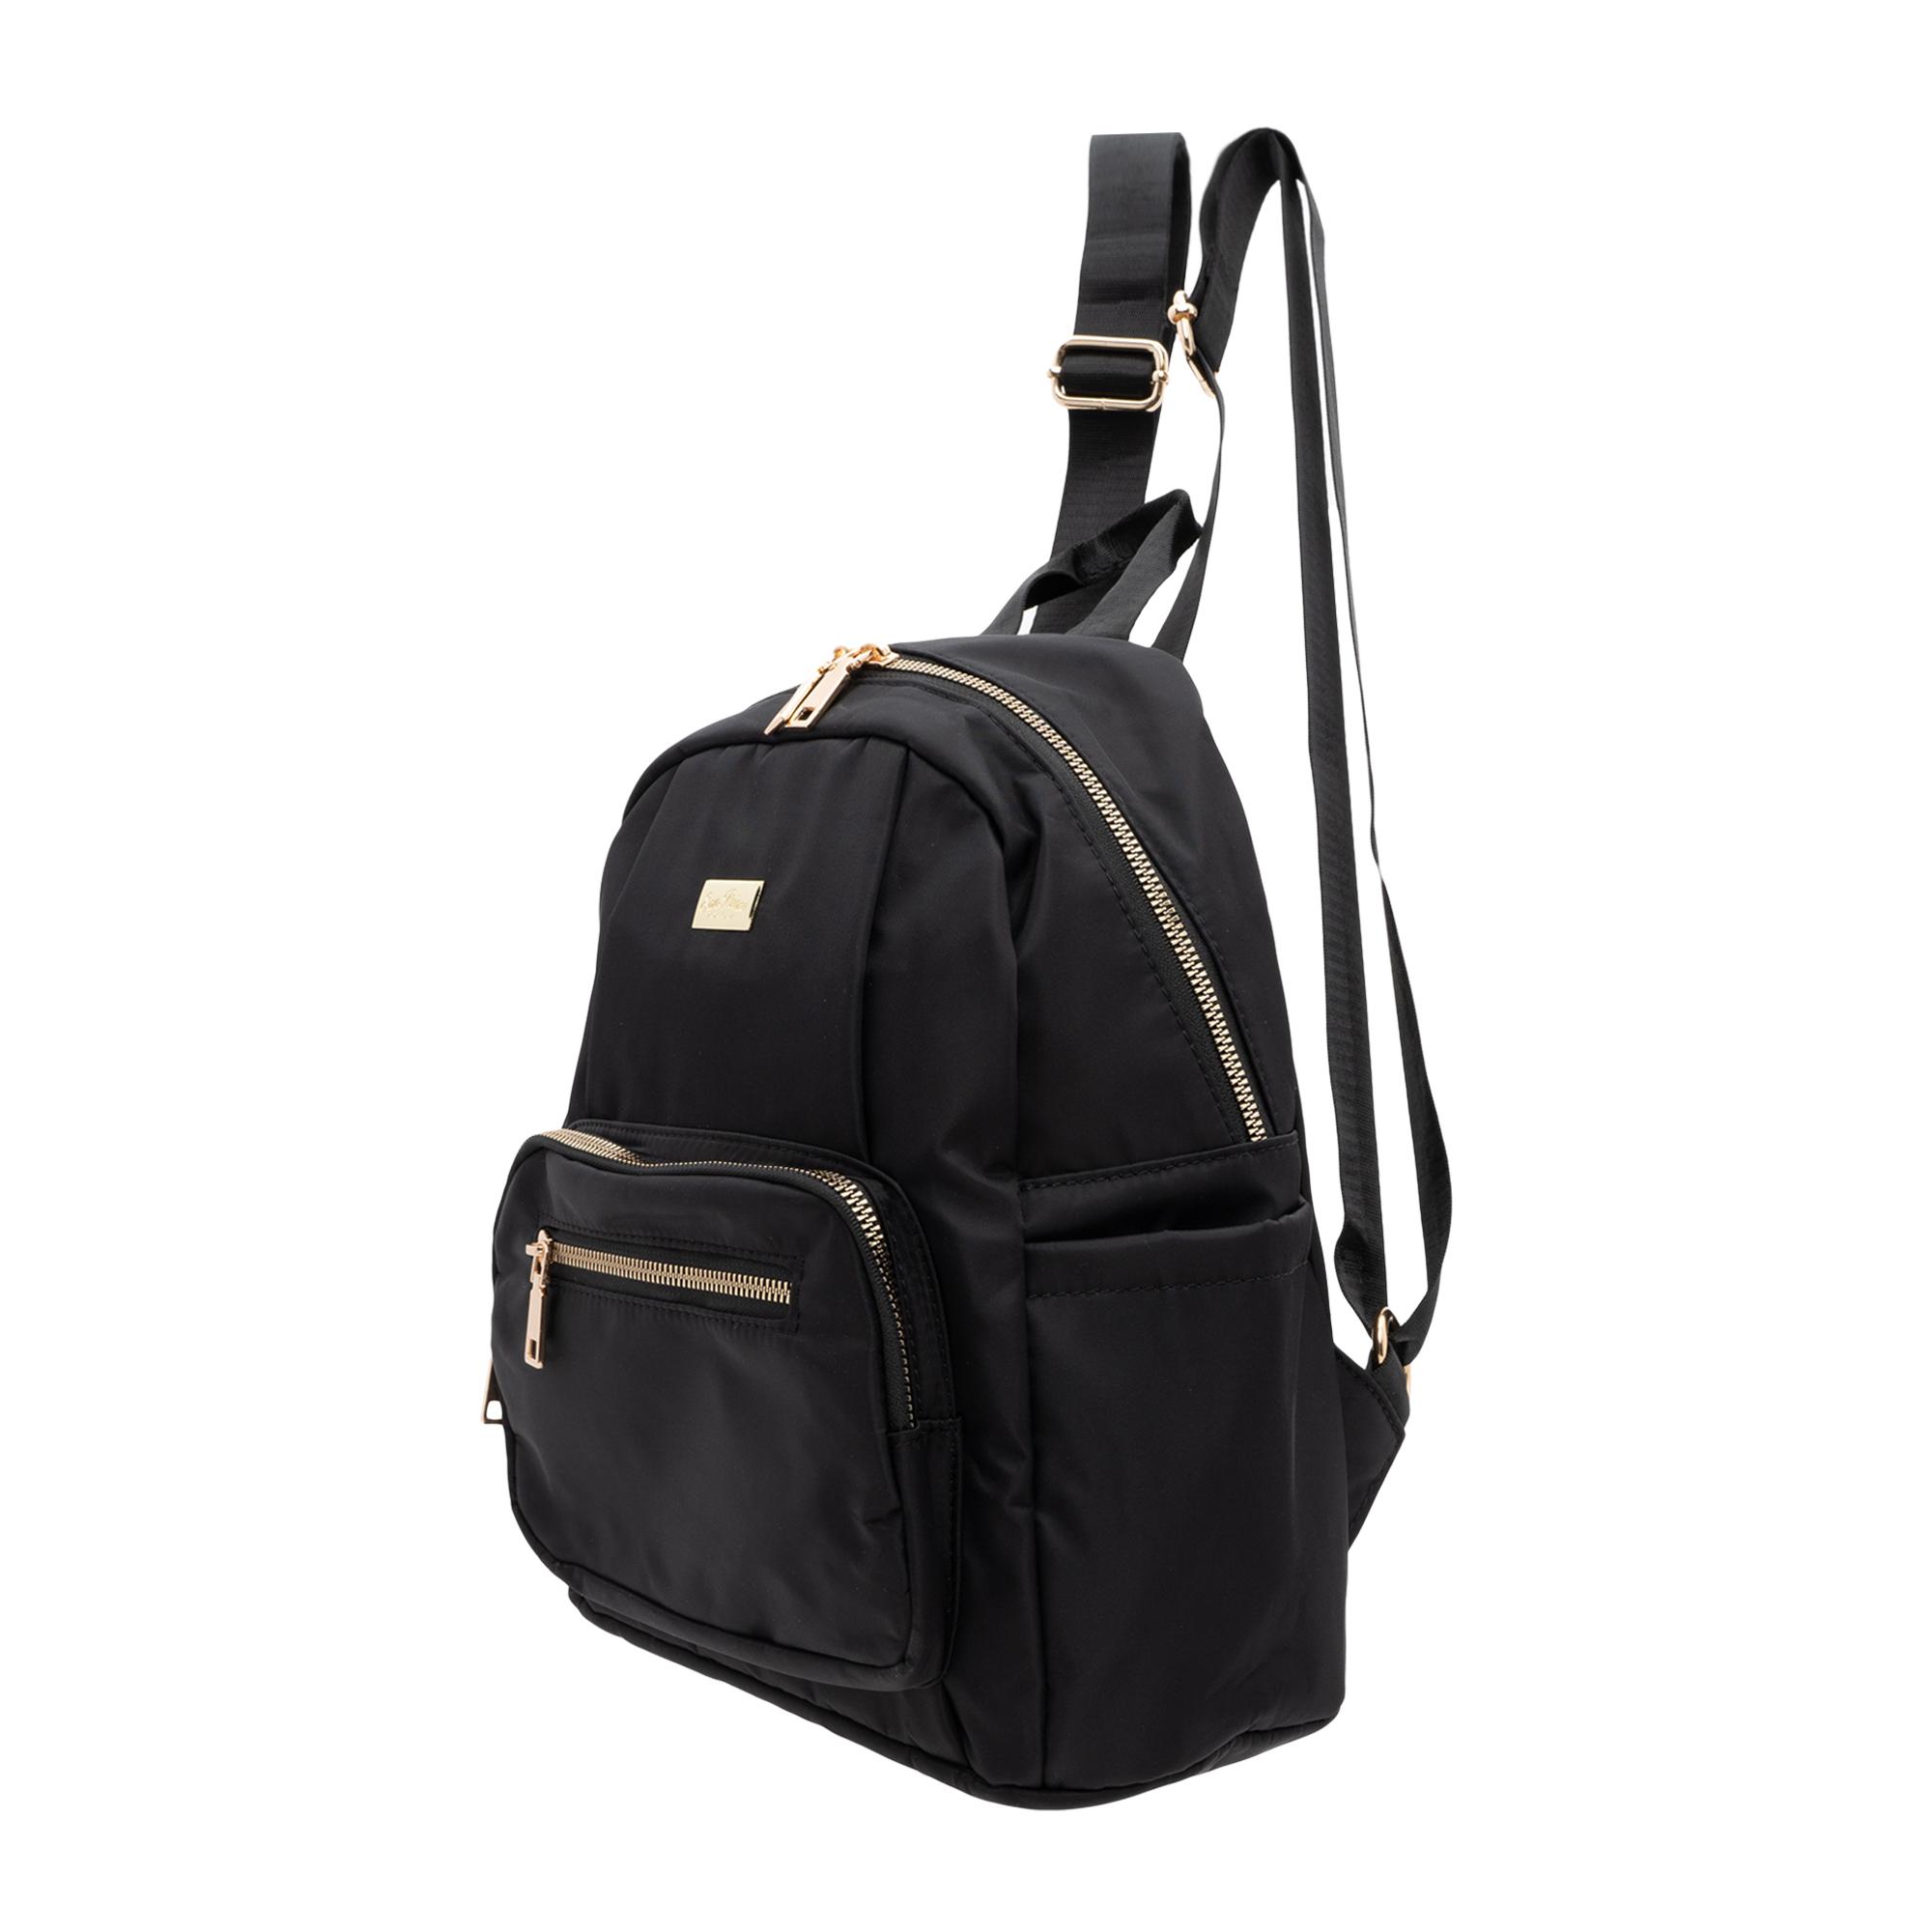 San Prisco Poloclub Nylon Backpack